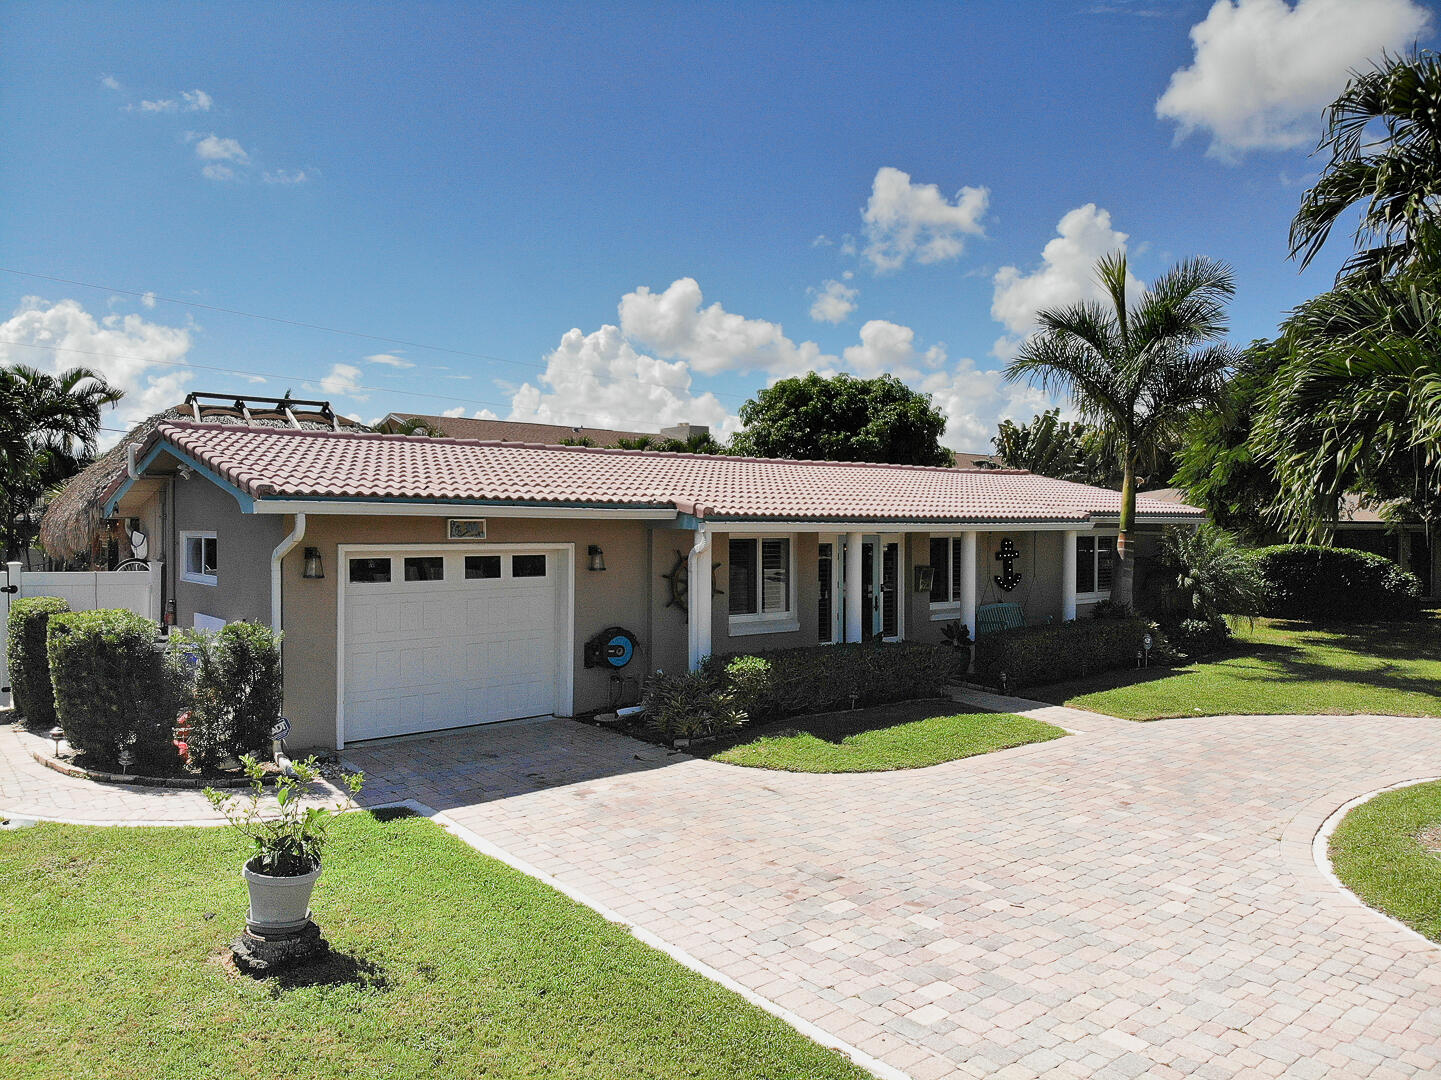 906 8th, Deerfield Beach, Florida 33441